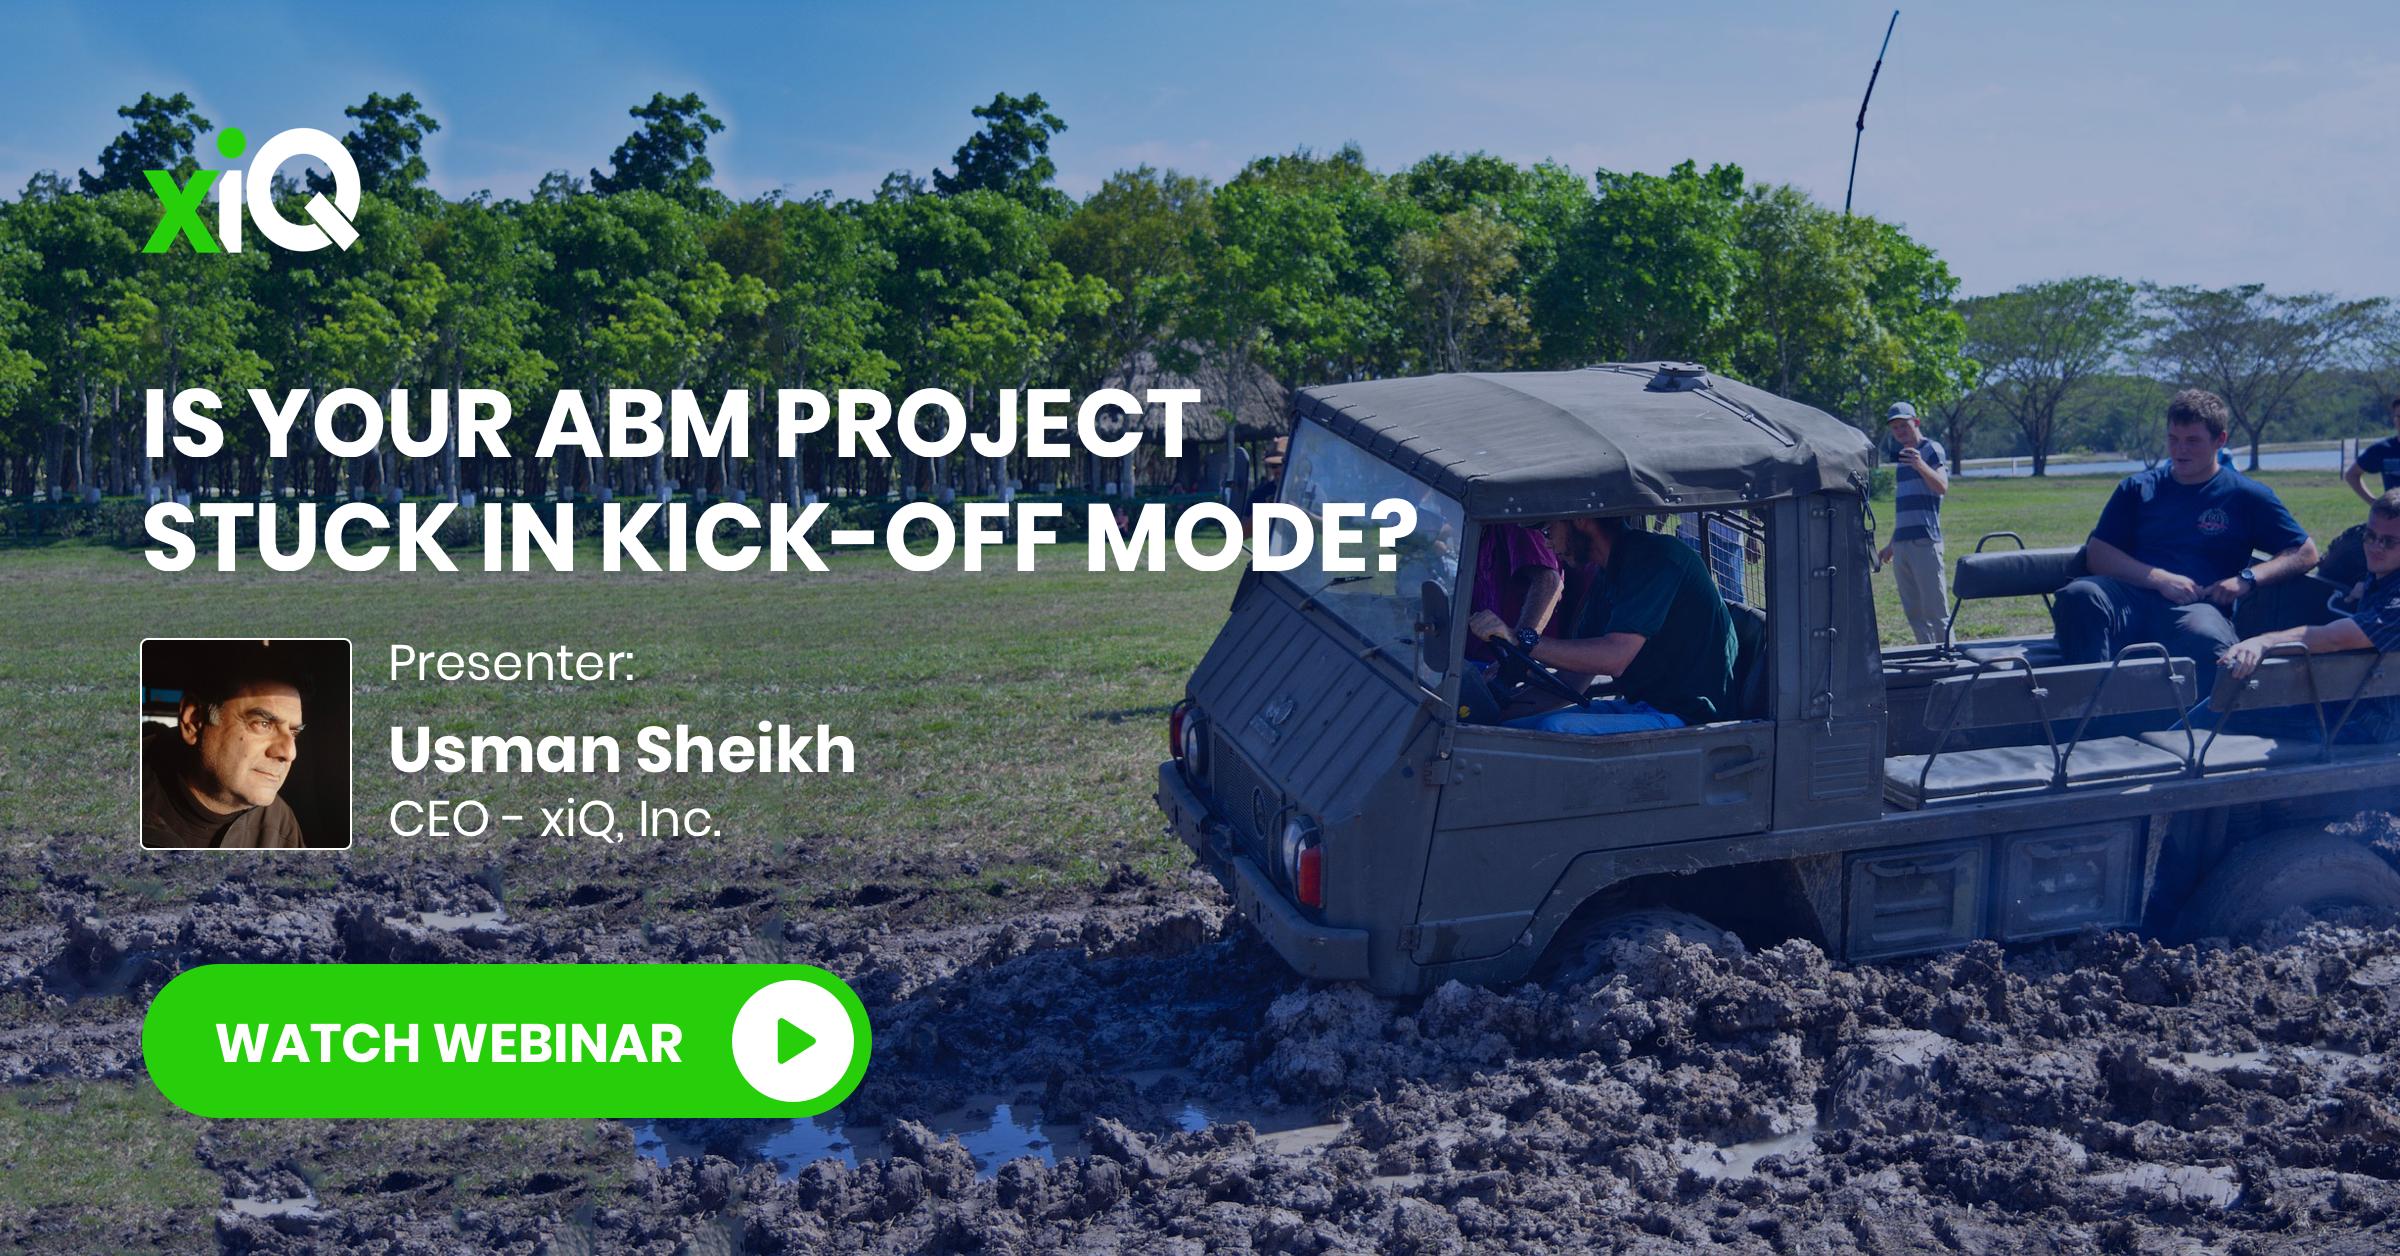 IS YOUR ABM PROJECT STUCK IN KICK-OFF MODE? – xiQ Webinar